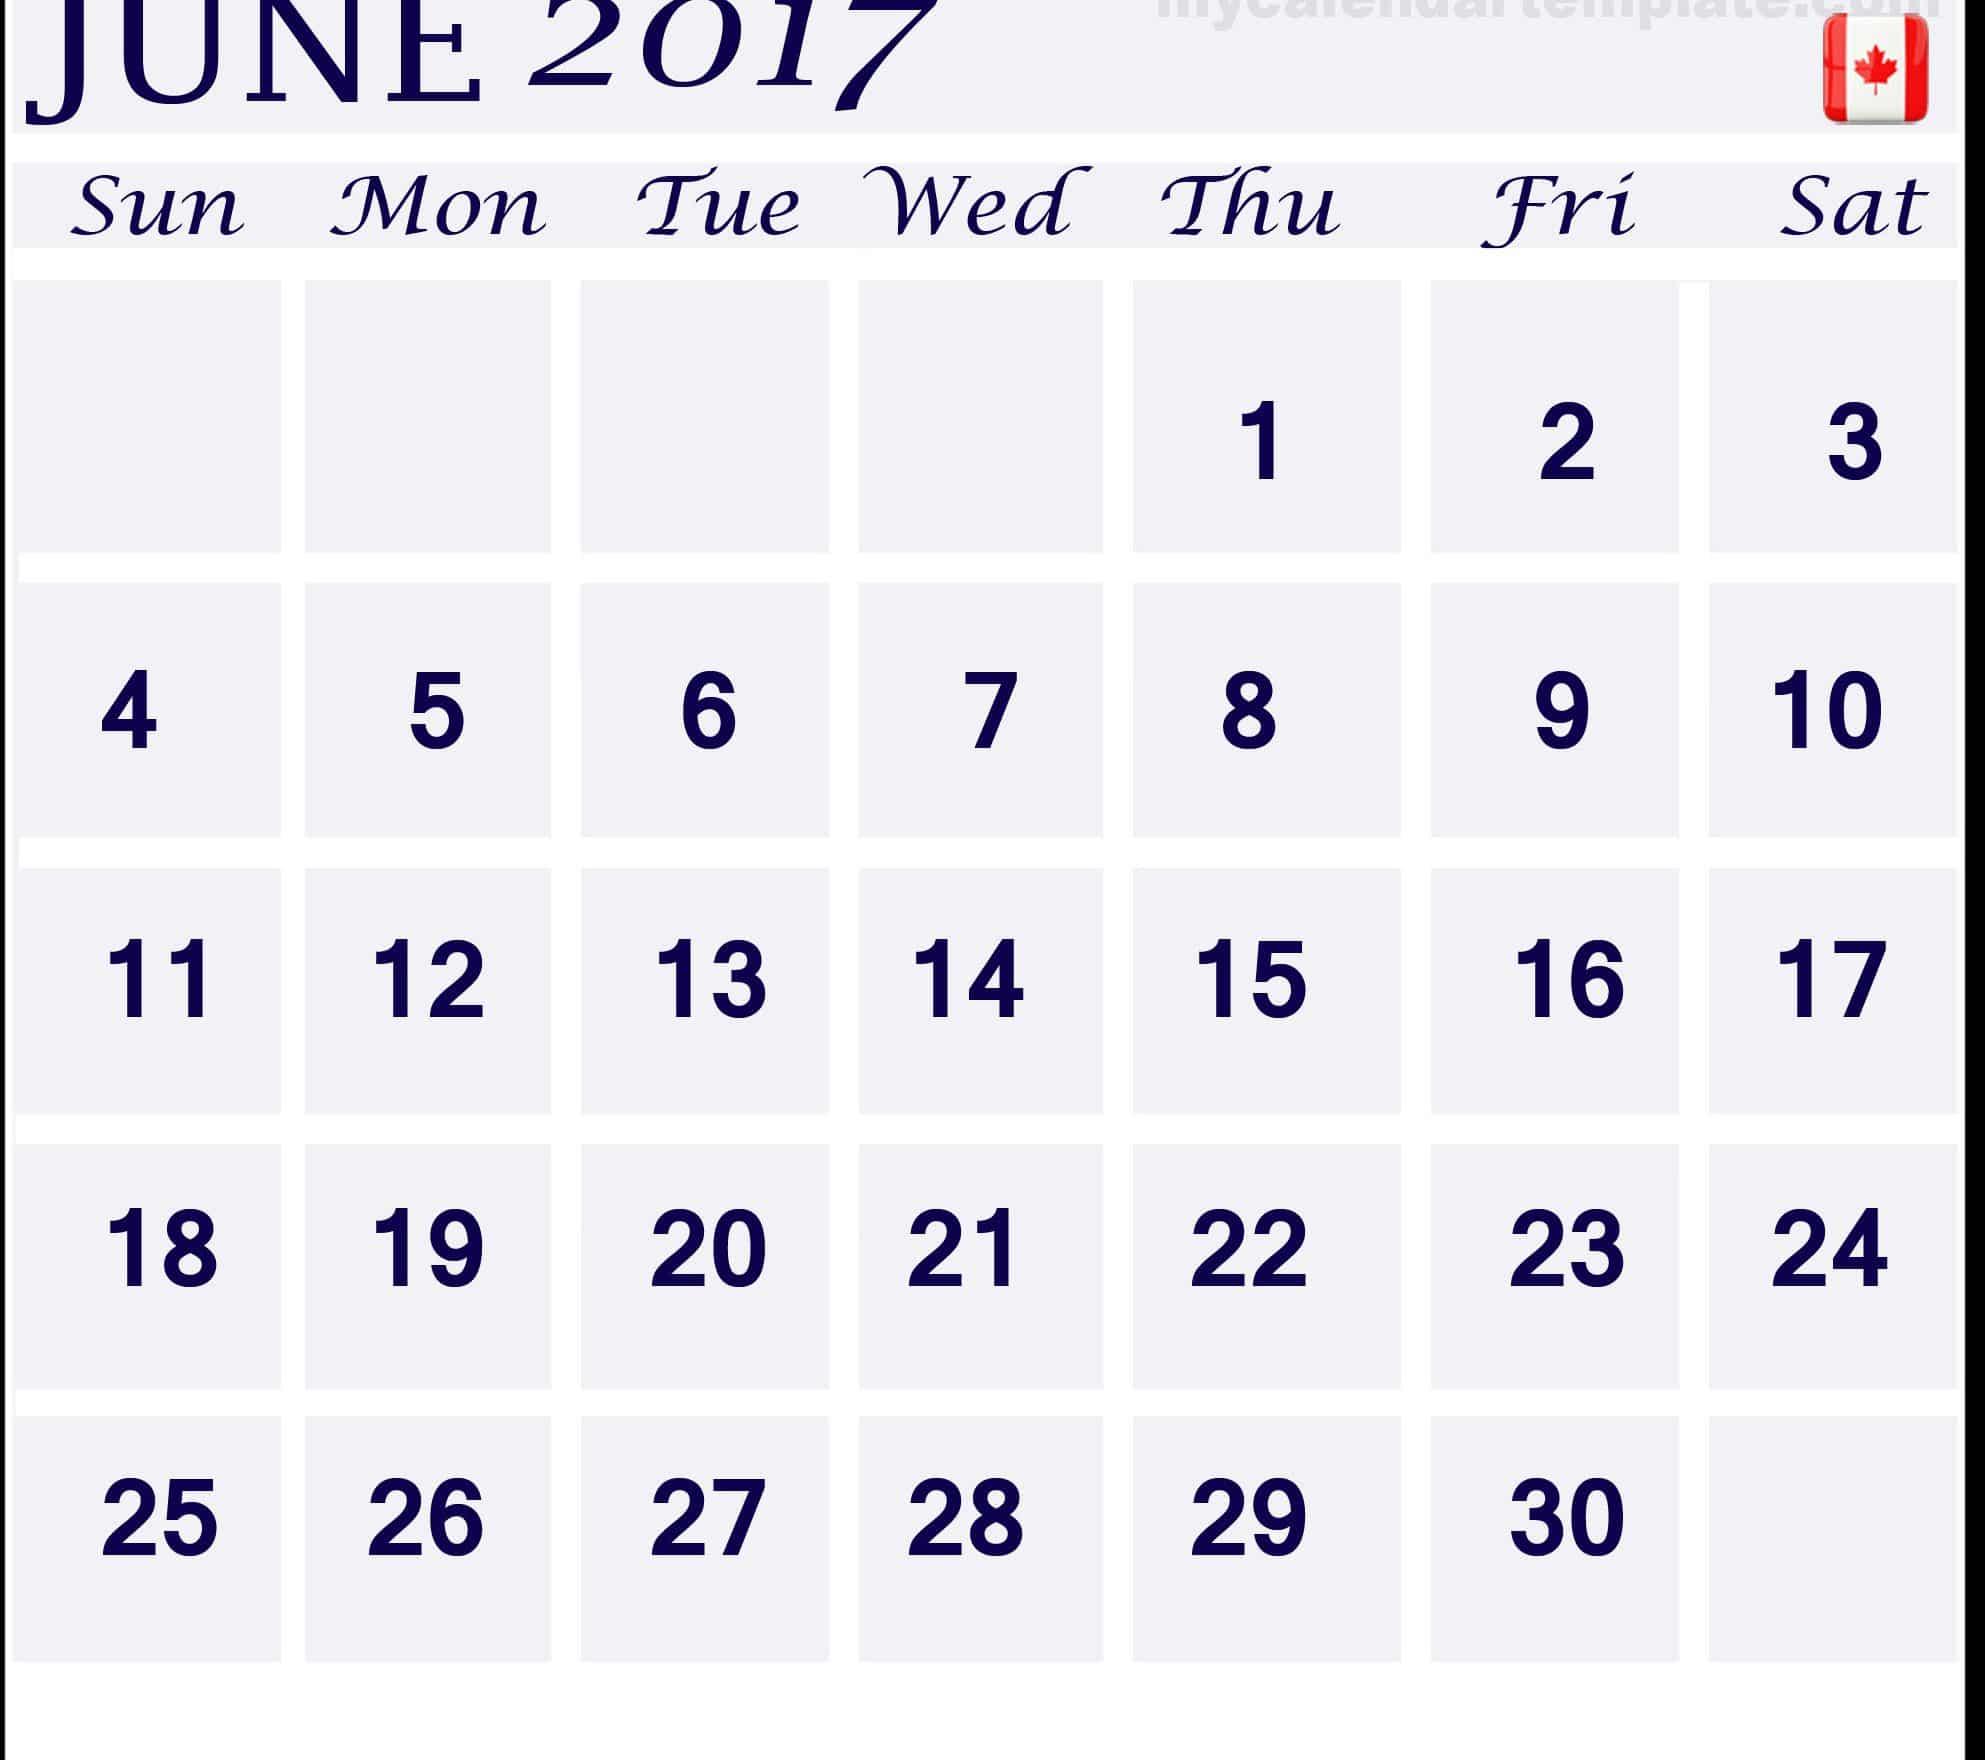 June 2017 calendar Canada Image